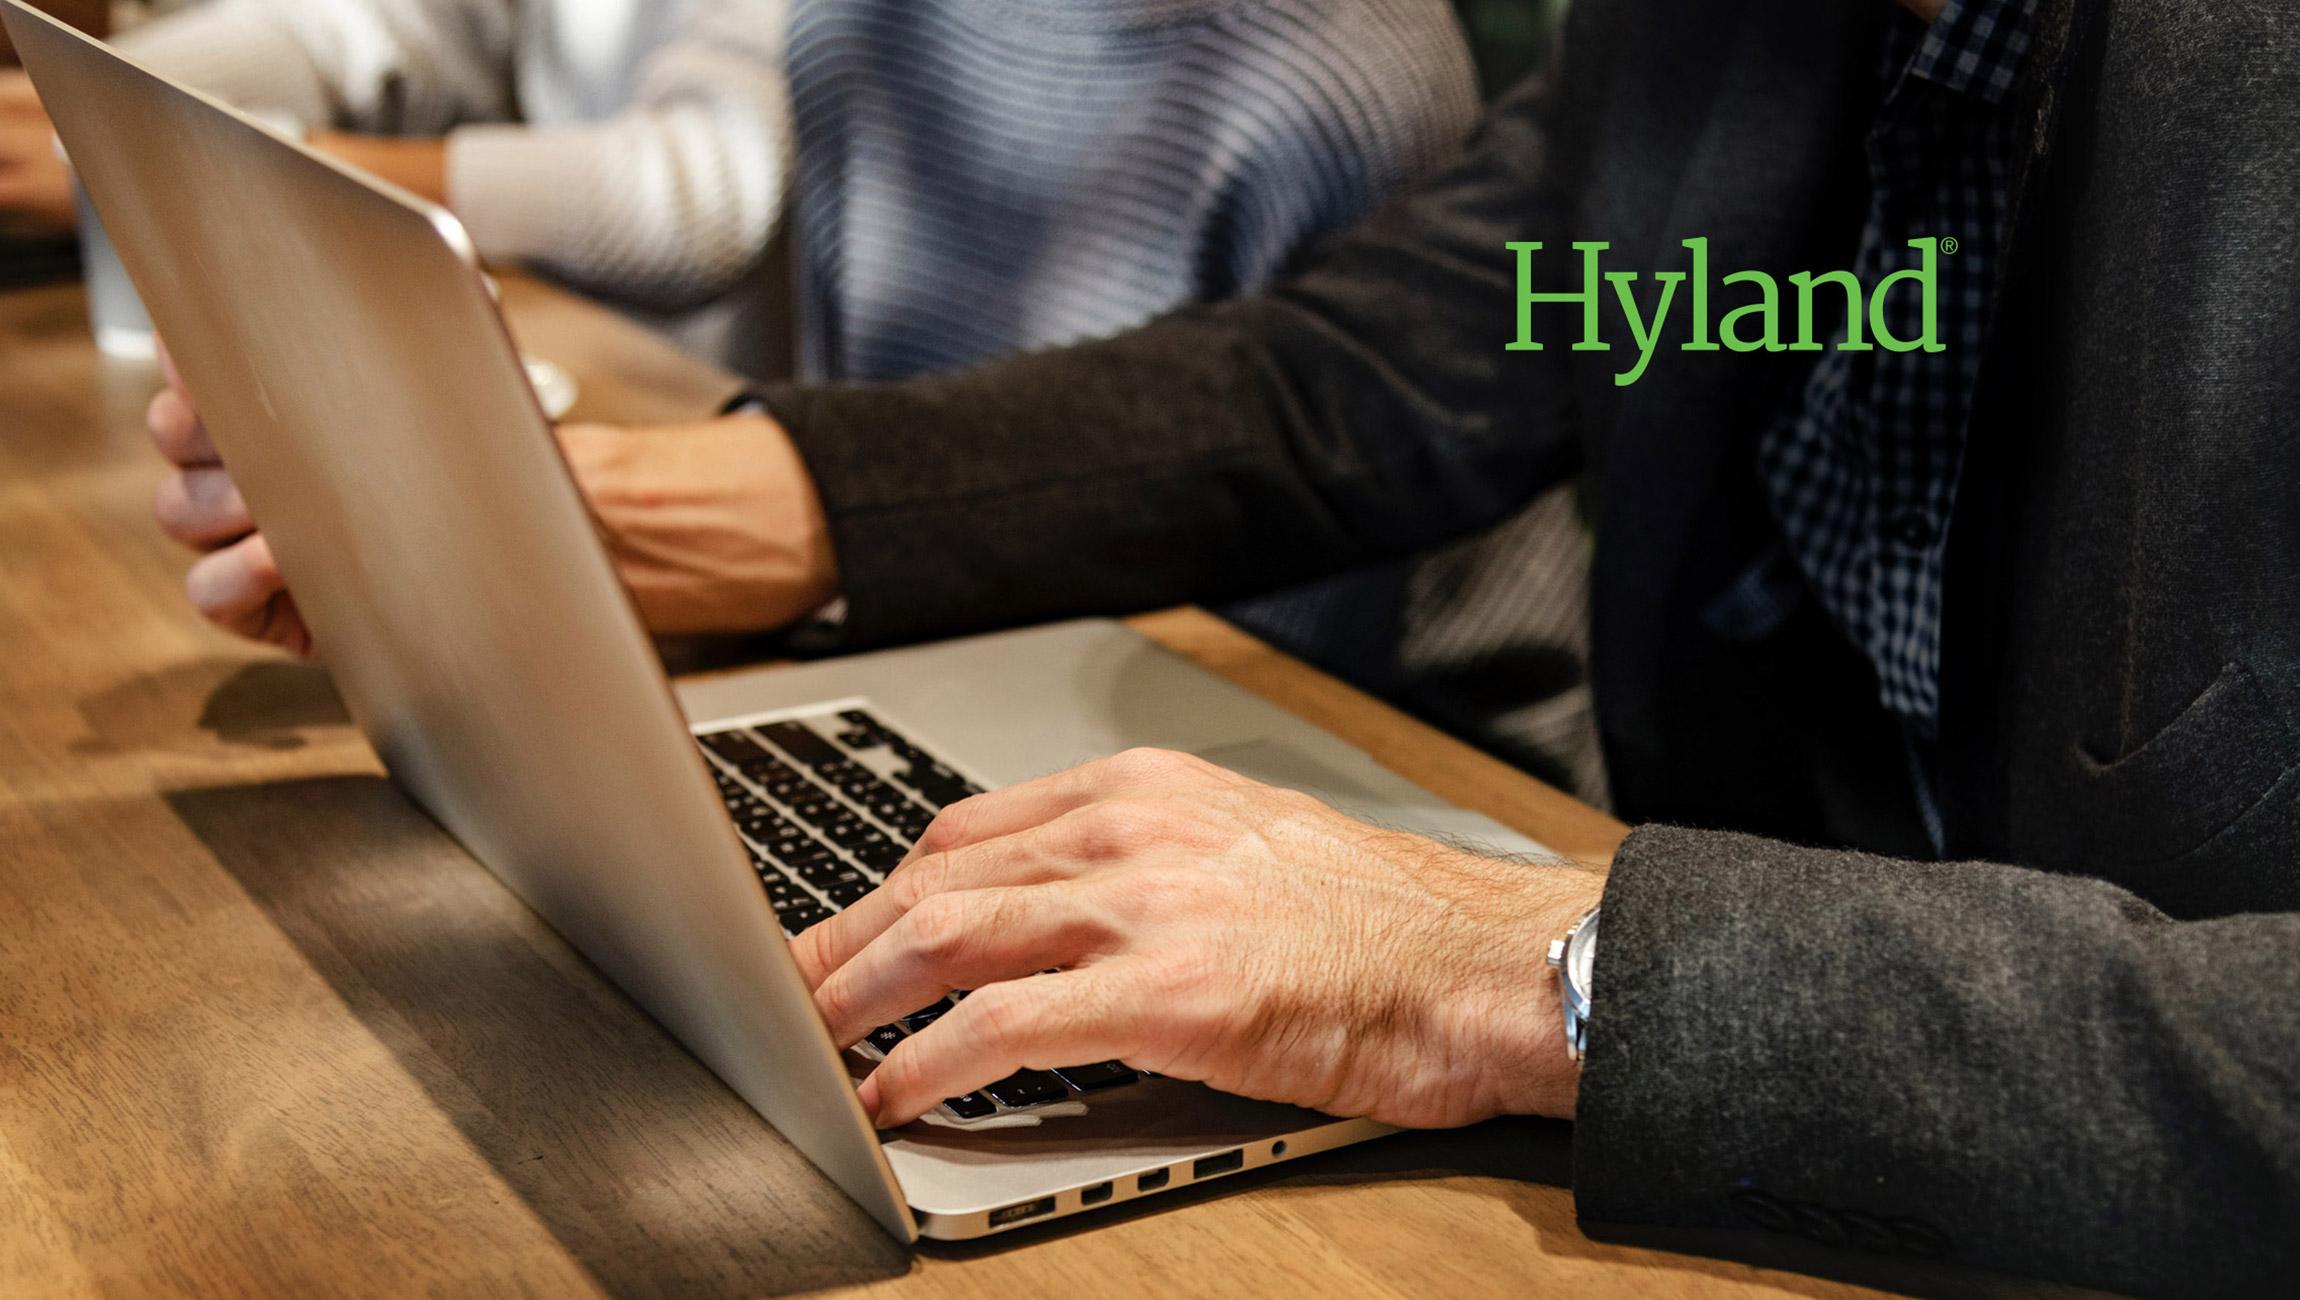 Hyland releases OnBase Integration for Salesforce on Salesforce AppExchange, the World's Leading Enterprise Cloud Marketplace